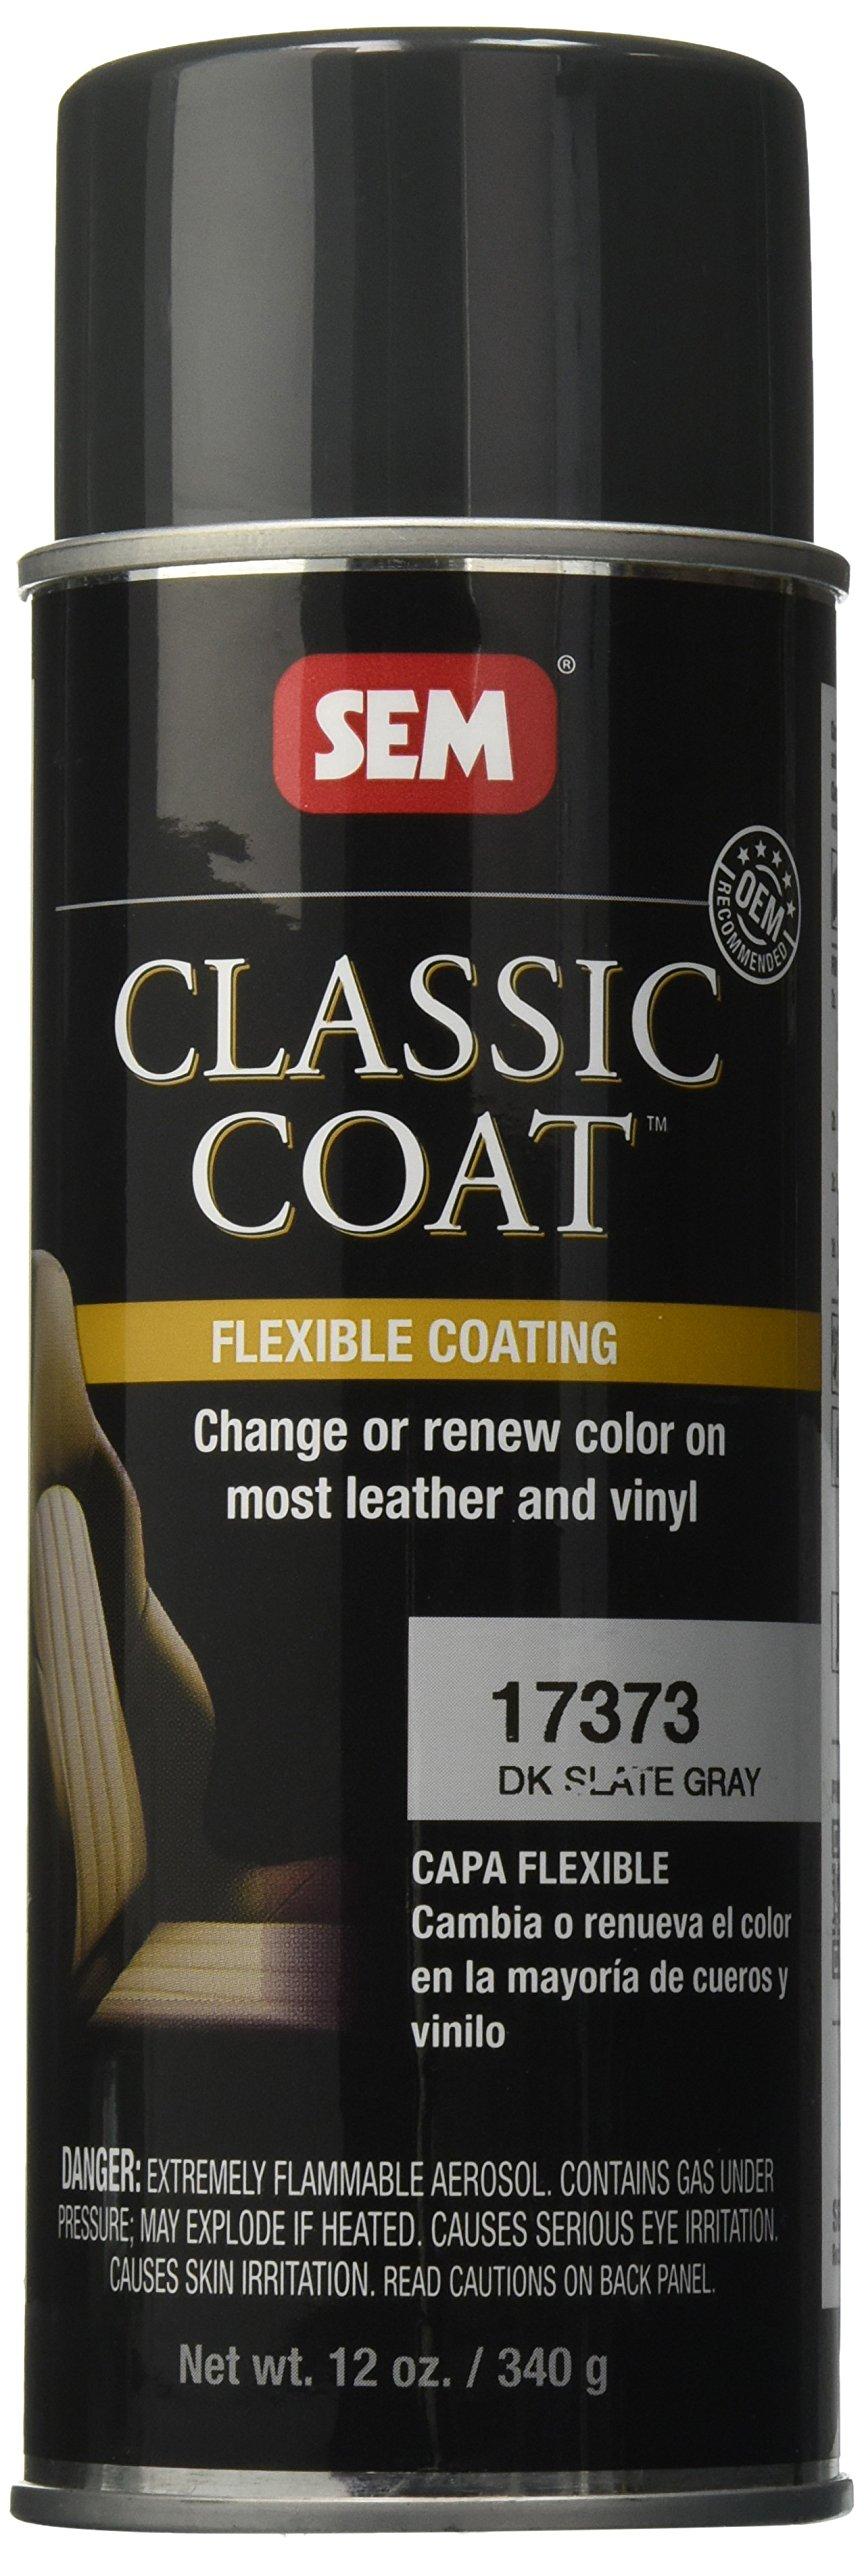 SEM 17373 Dark Slate Gray Classic Coat - 12 oz. by SEM